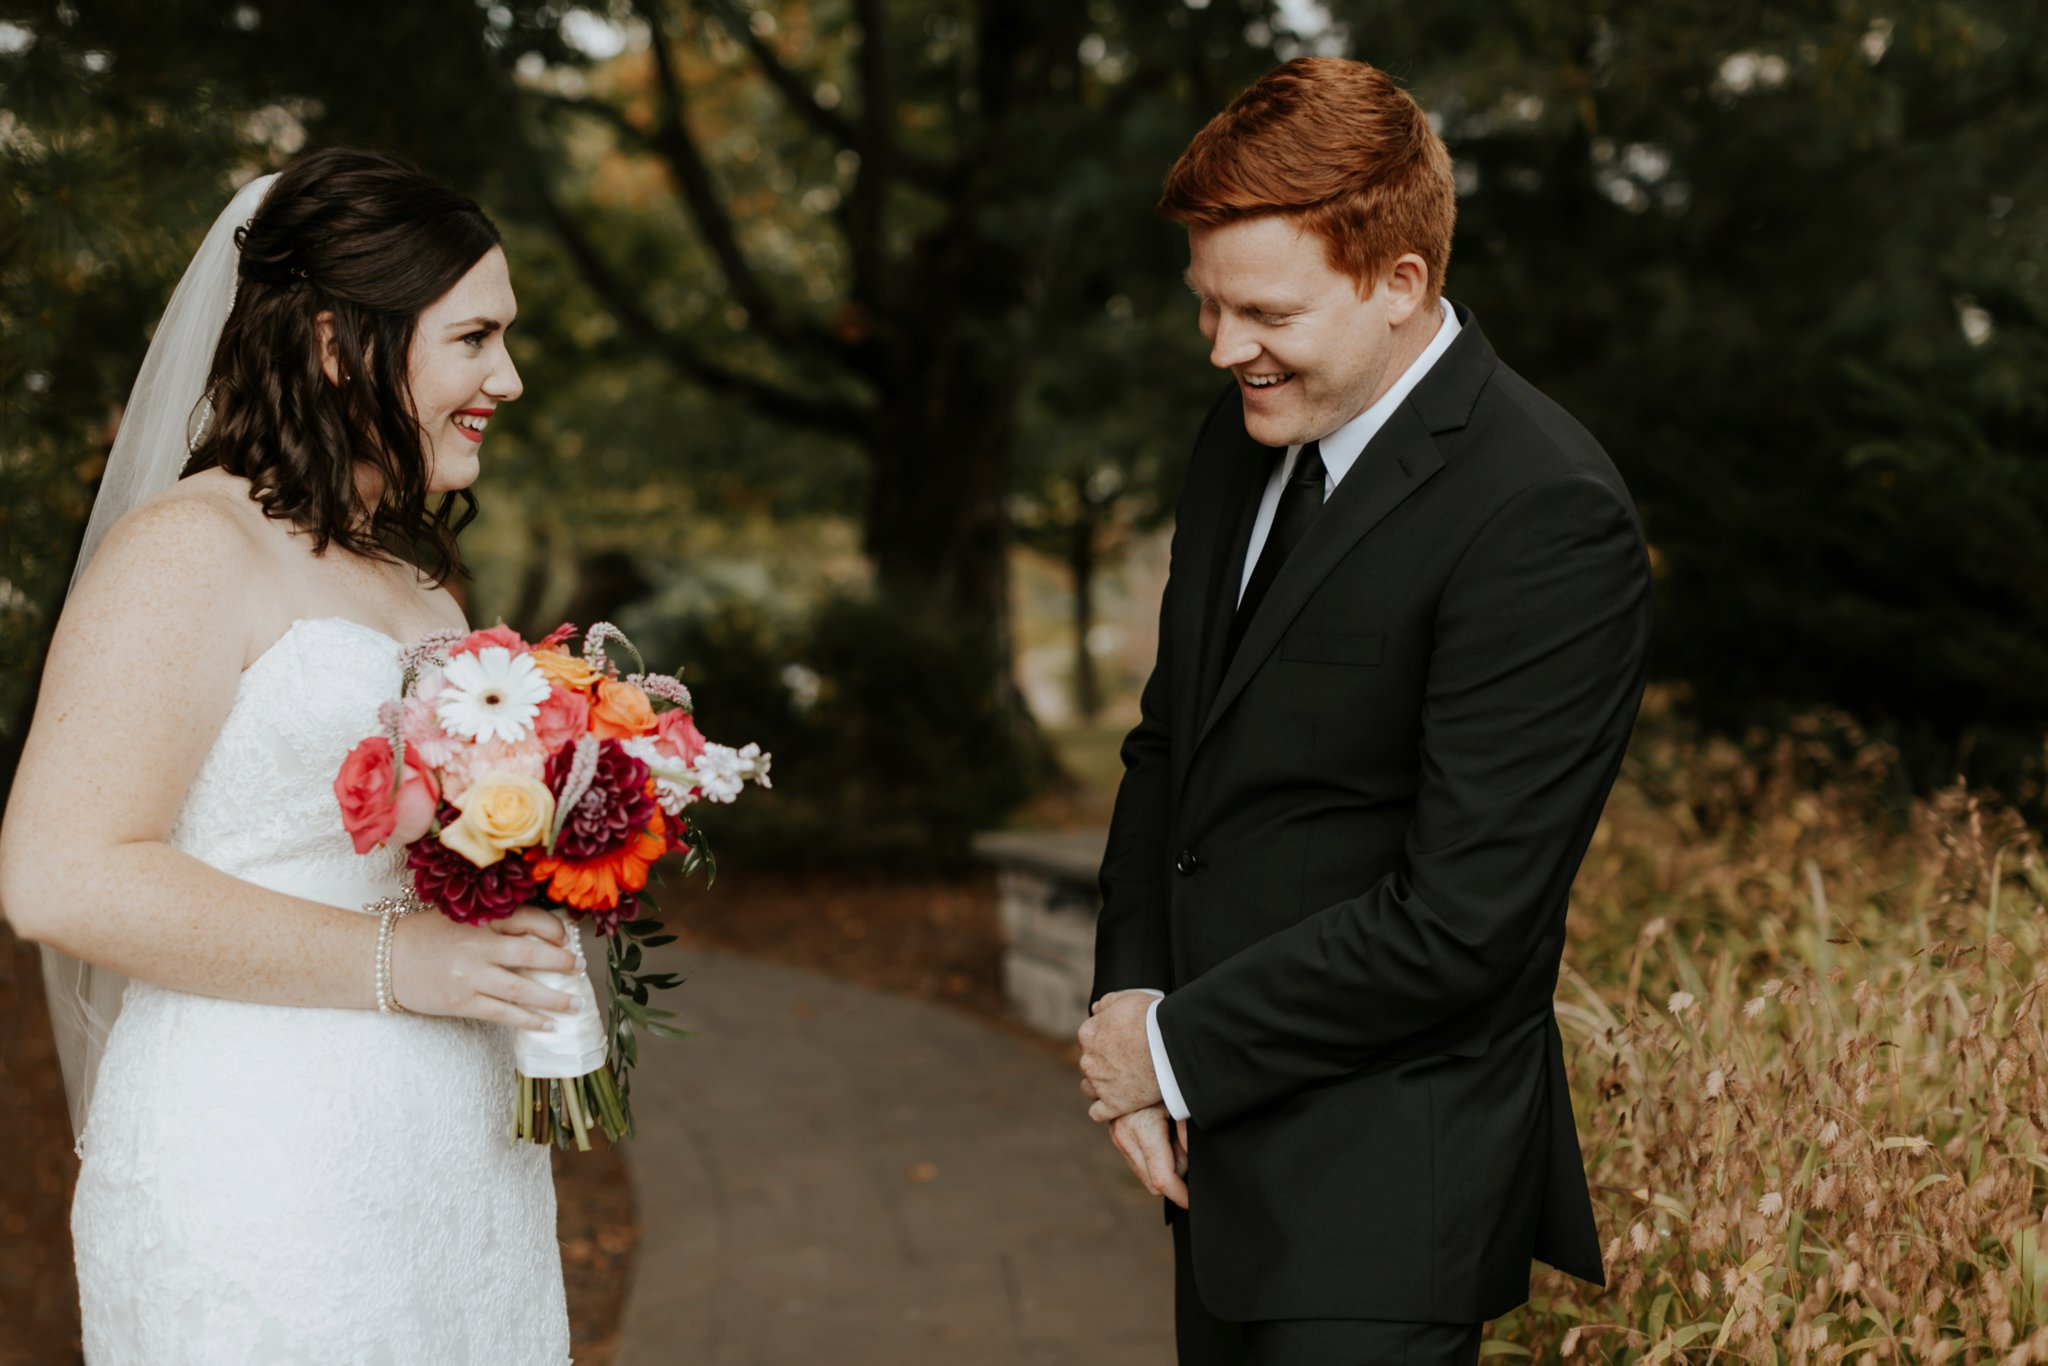 17-09-15 Lindsey and Brandon Wedding Edited-285_WEB.jpg